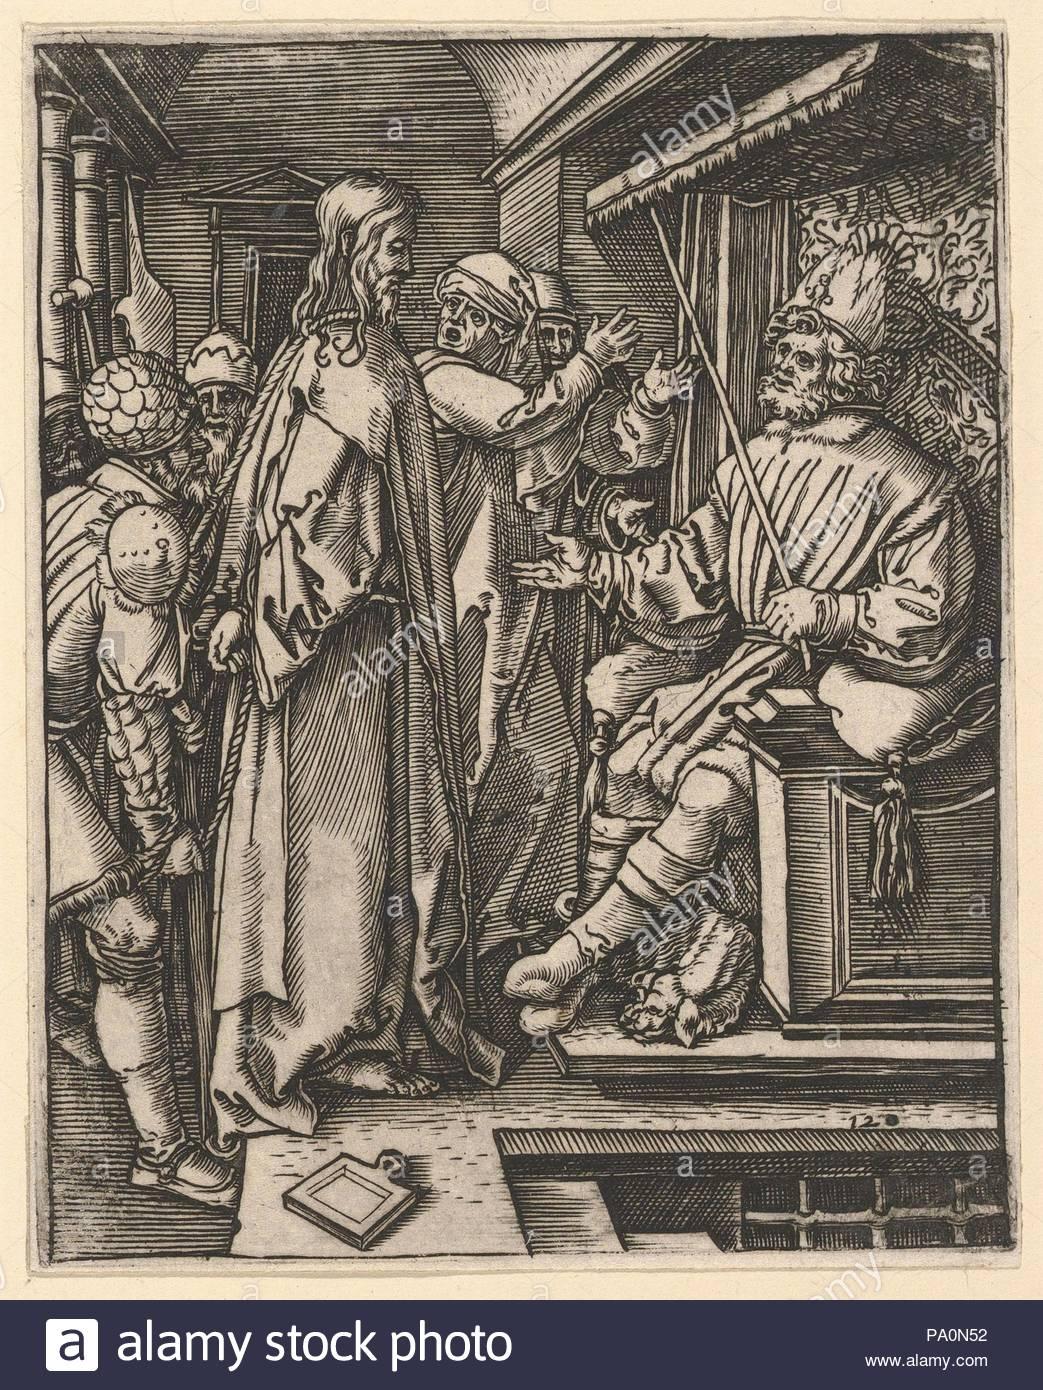 Christ standing, hands tied behind back, before Herod seated on throne, after Dürer, ca. 1500–1534, Engraving; second state of three, Sheet: 5 1/16 in. × 4 in. (12.8 × 10.2 cm), Prints, Marcantonio Raimondi (Italian, Argini (?) ca. 1480–before 1534 Bologna (?)), After Albrecht Dürer (German, Nuremberg 1471–1528 Nuremberg). - Stock Image